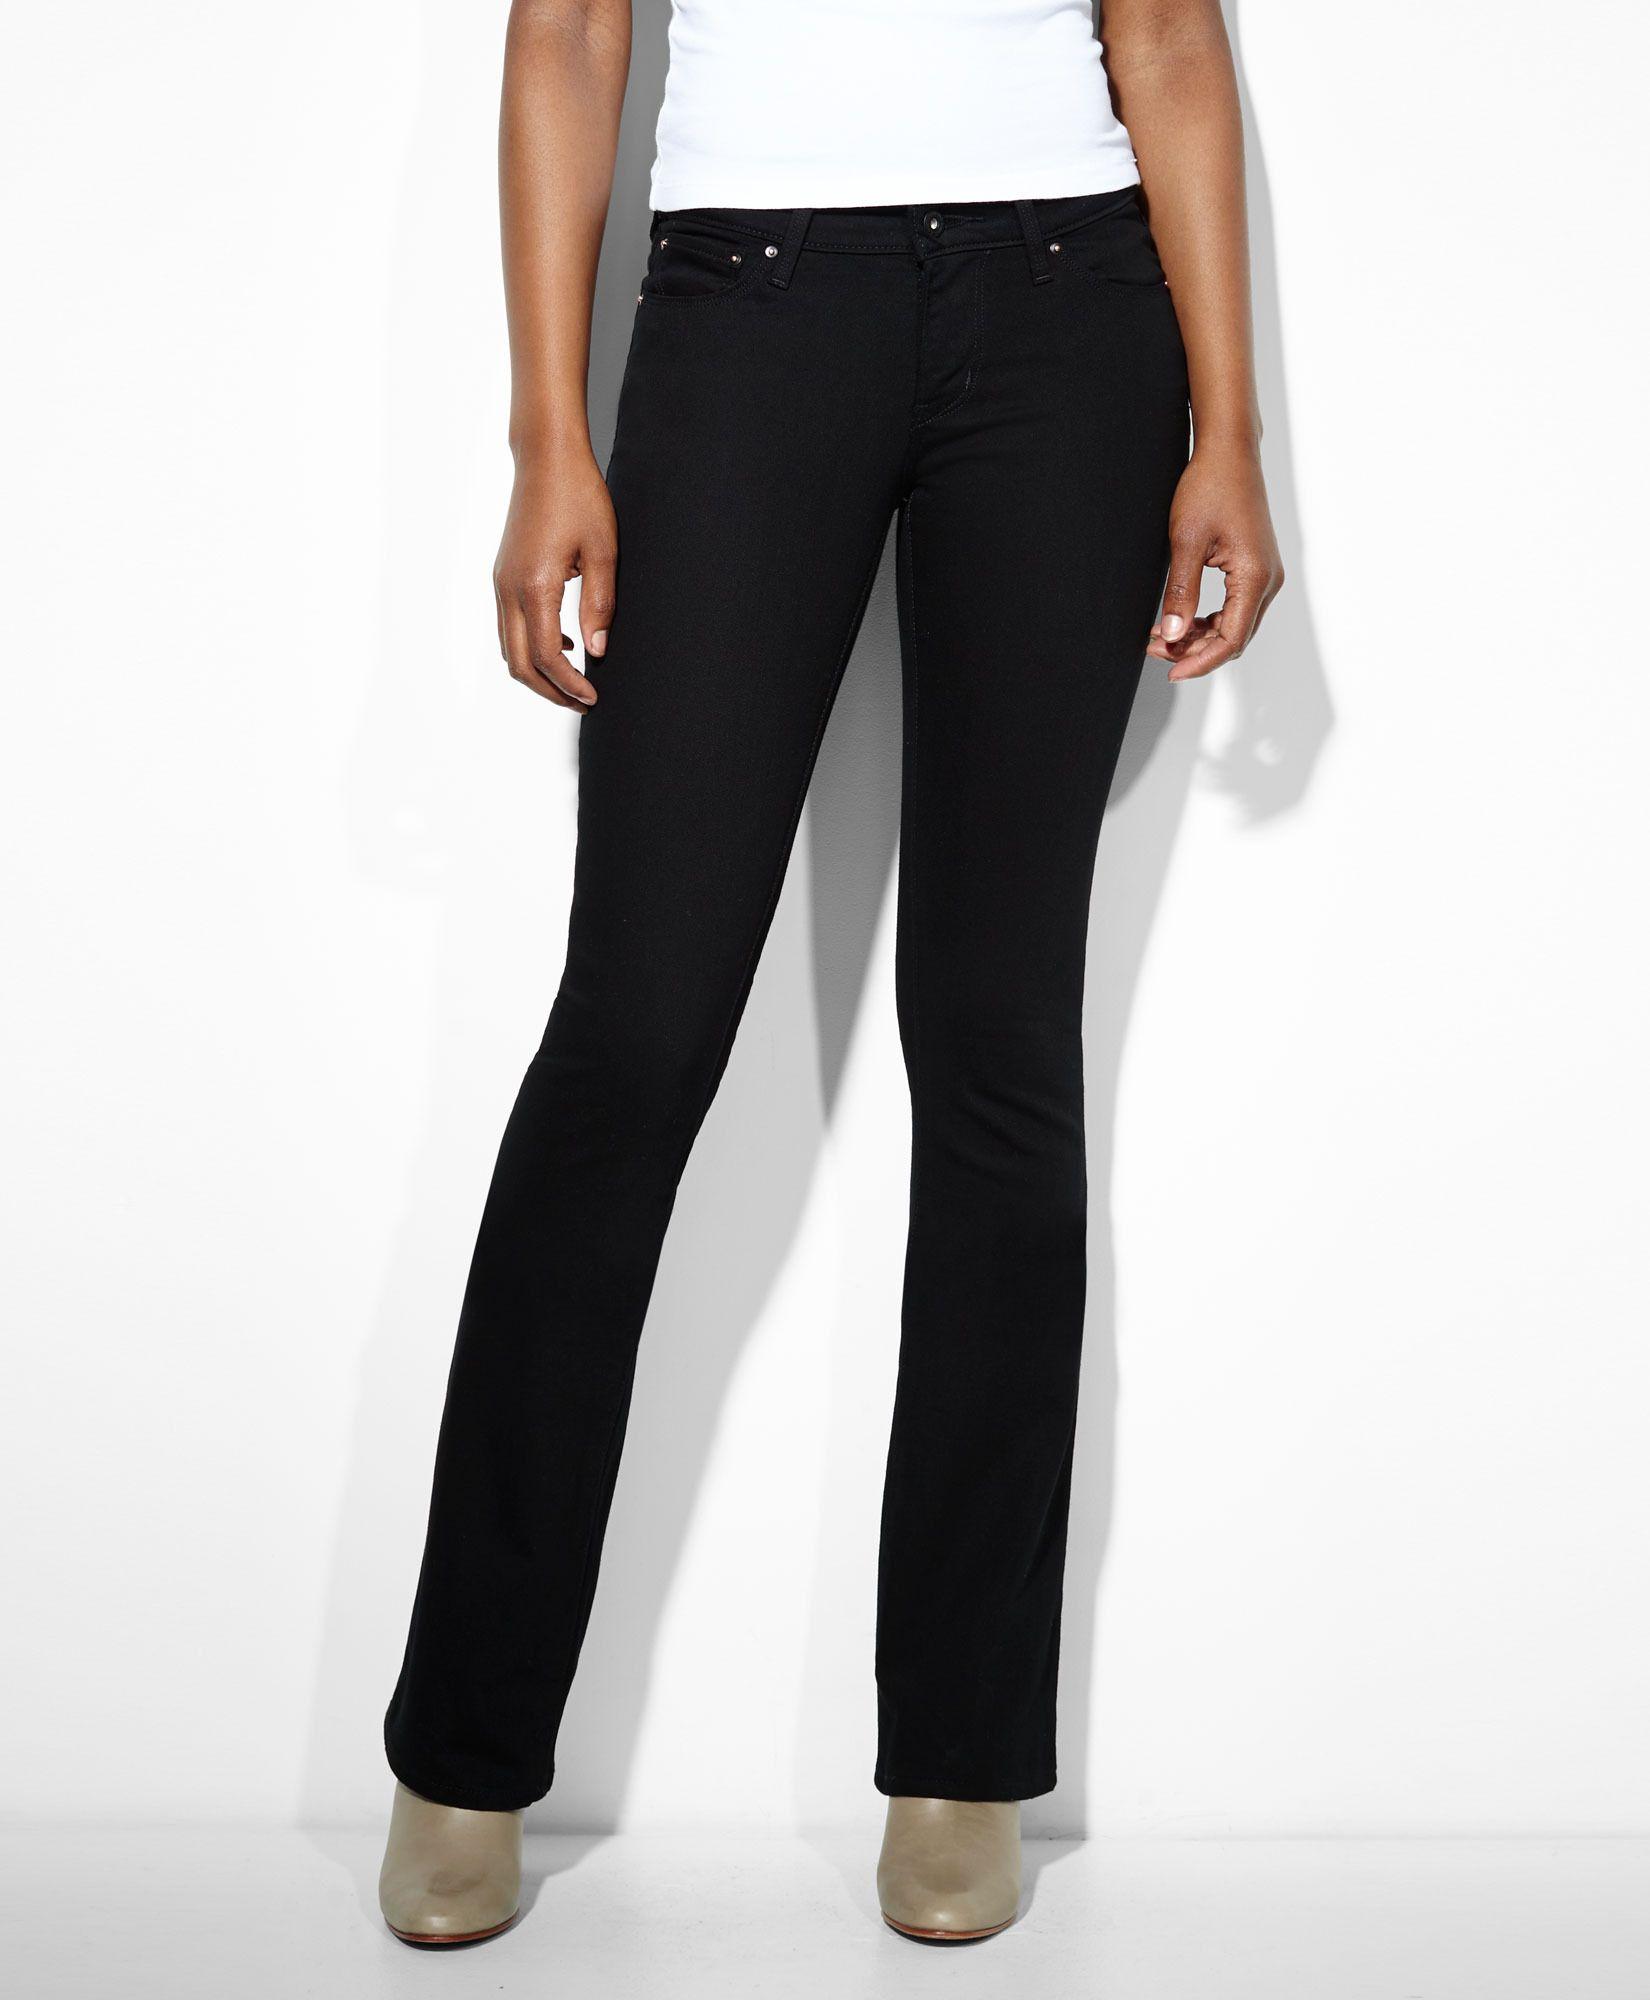 8ec75d75924f Levi s Modern Rise Bold Curve Bootcut Skinny Jeans   Black Levis